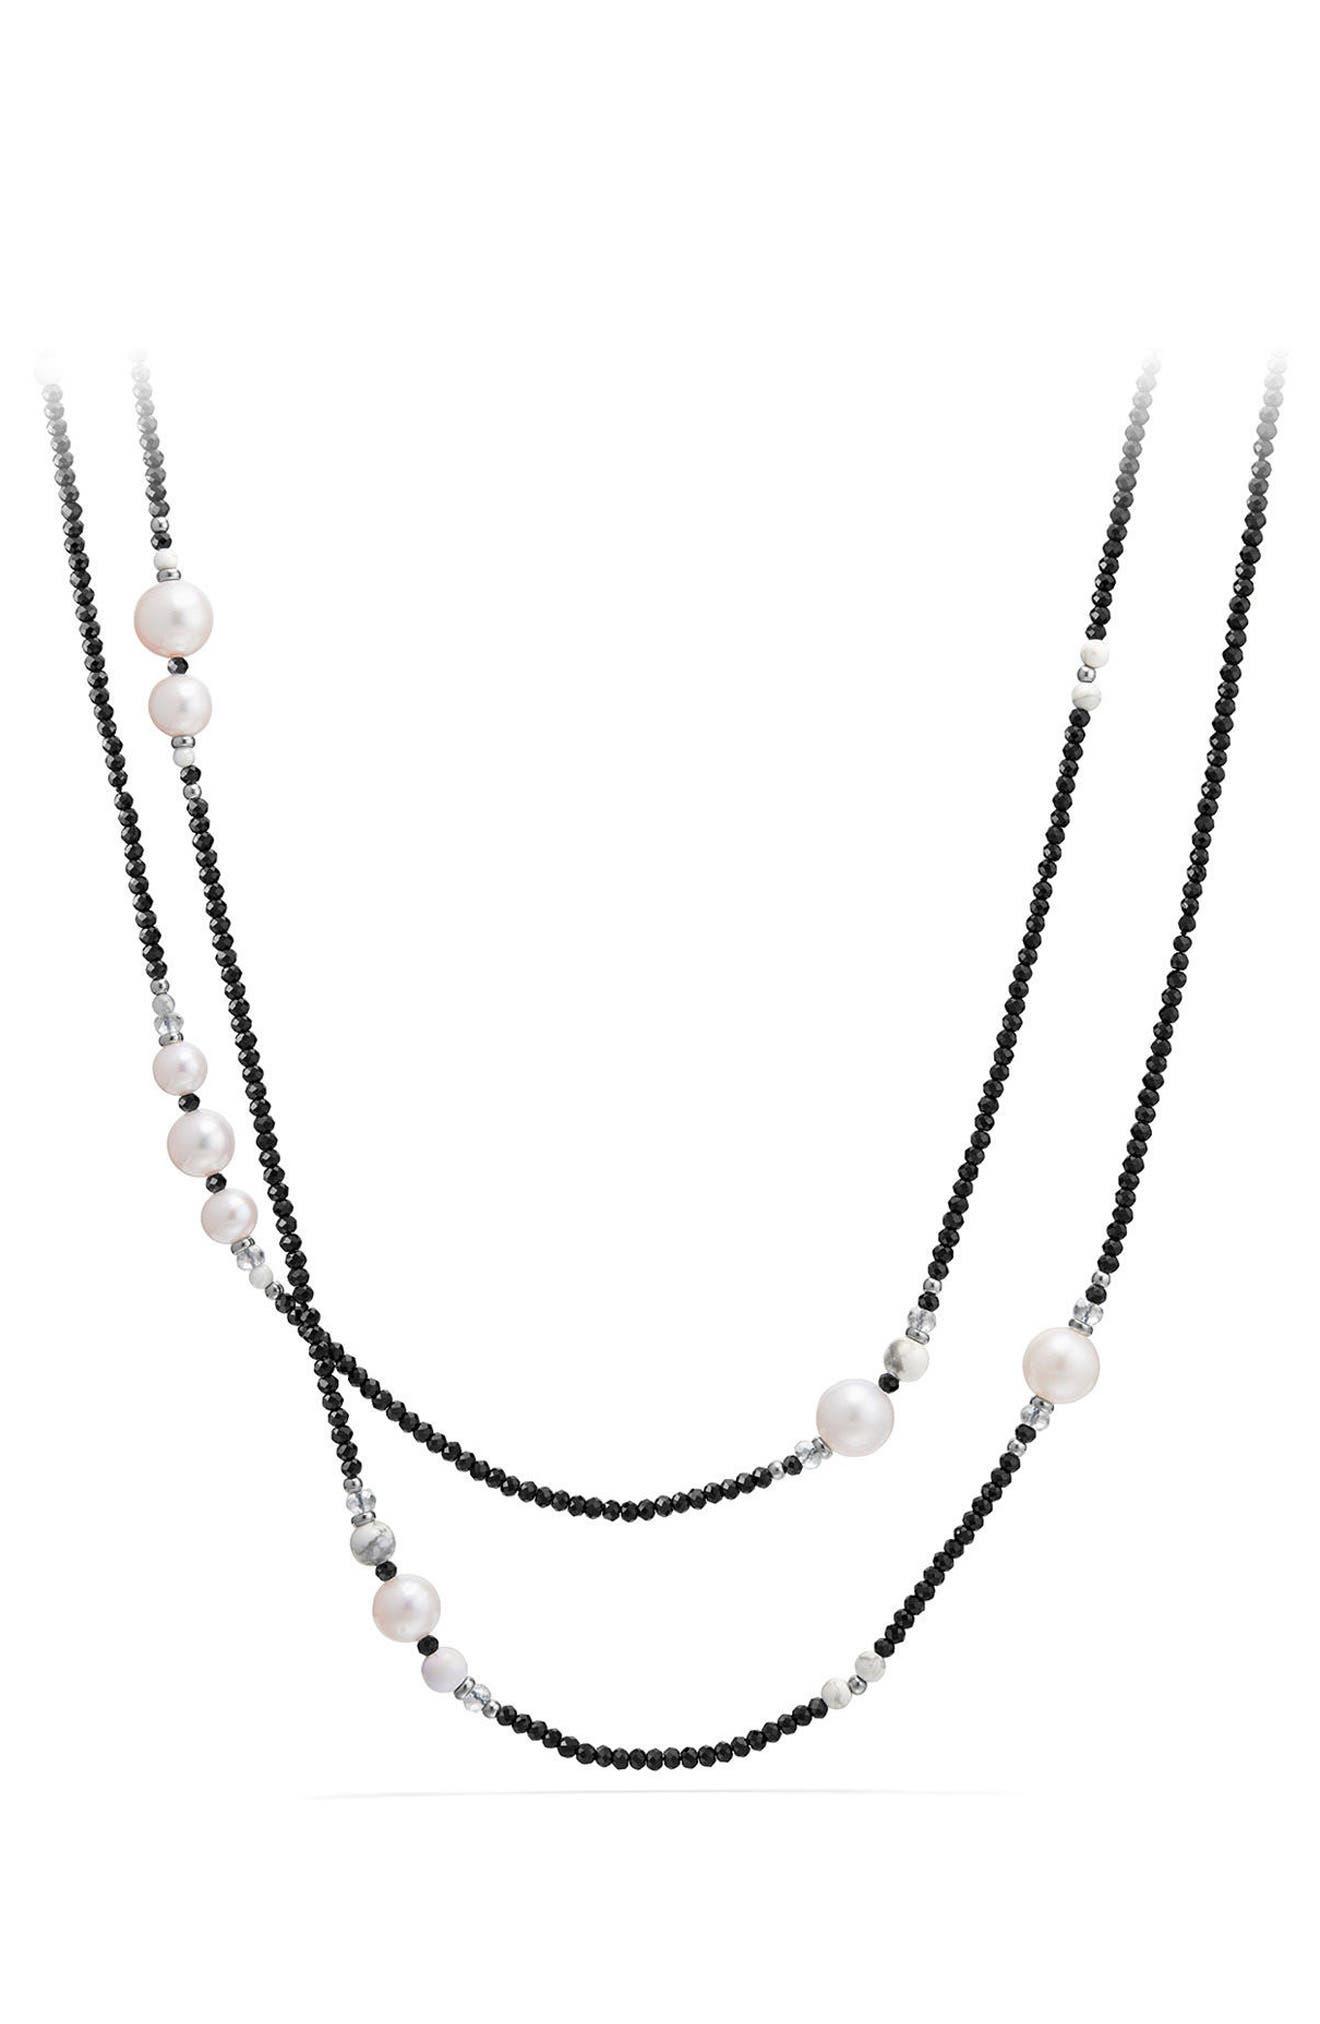 DAVID YURMAN, Solari - Tweejoux Pearl Necklace, Main thumbnail 1, color, PEARL/ BLACK SPINEL